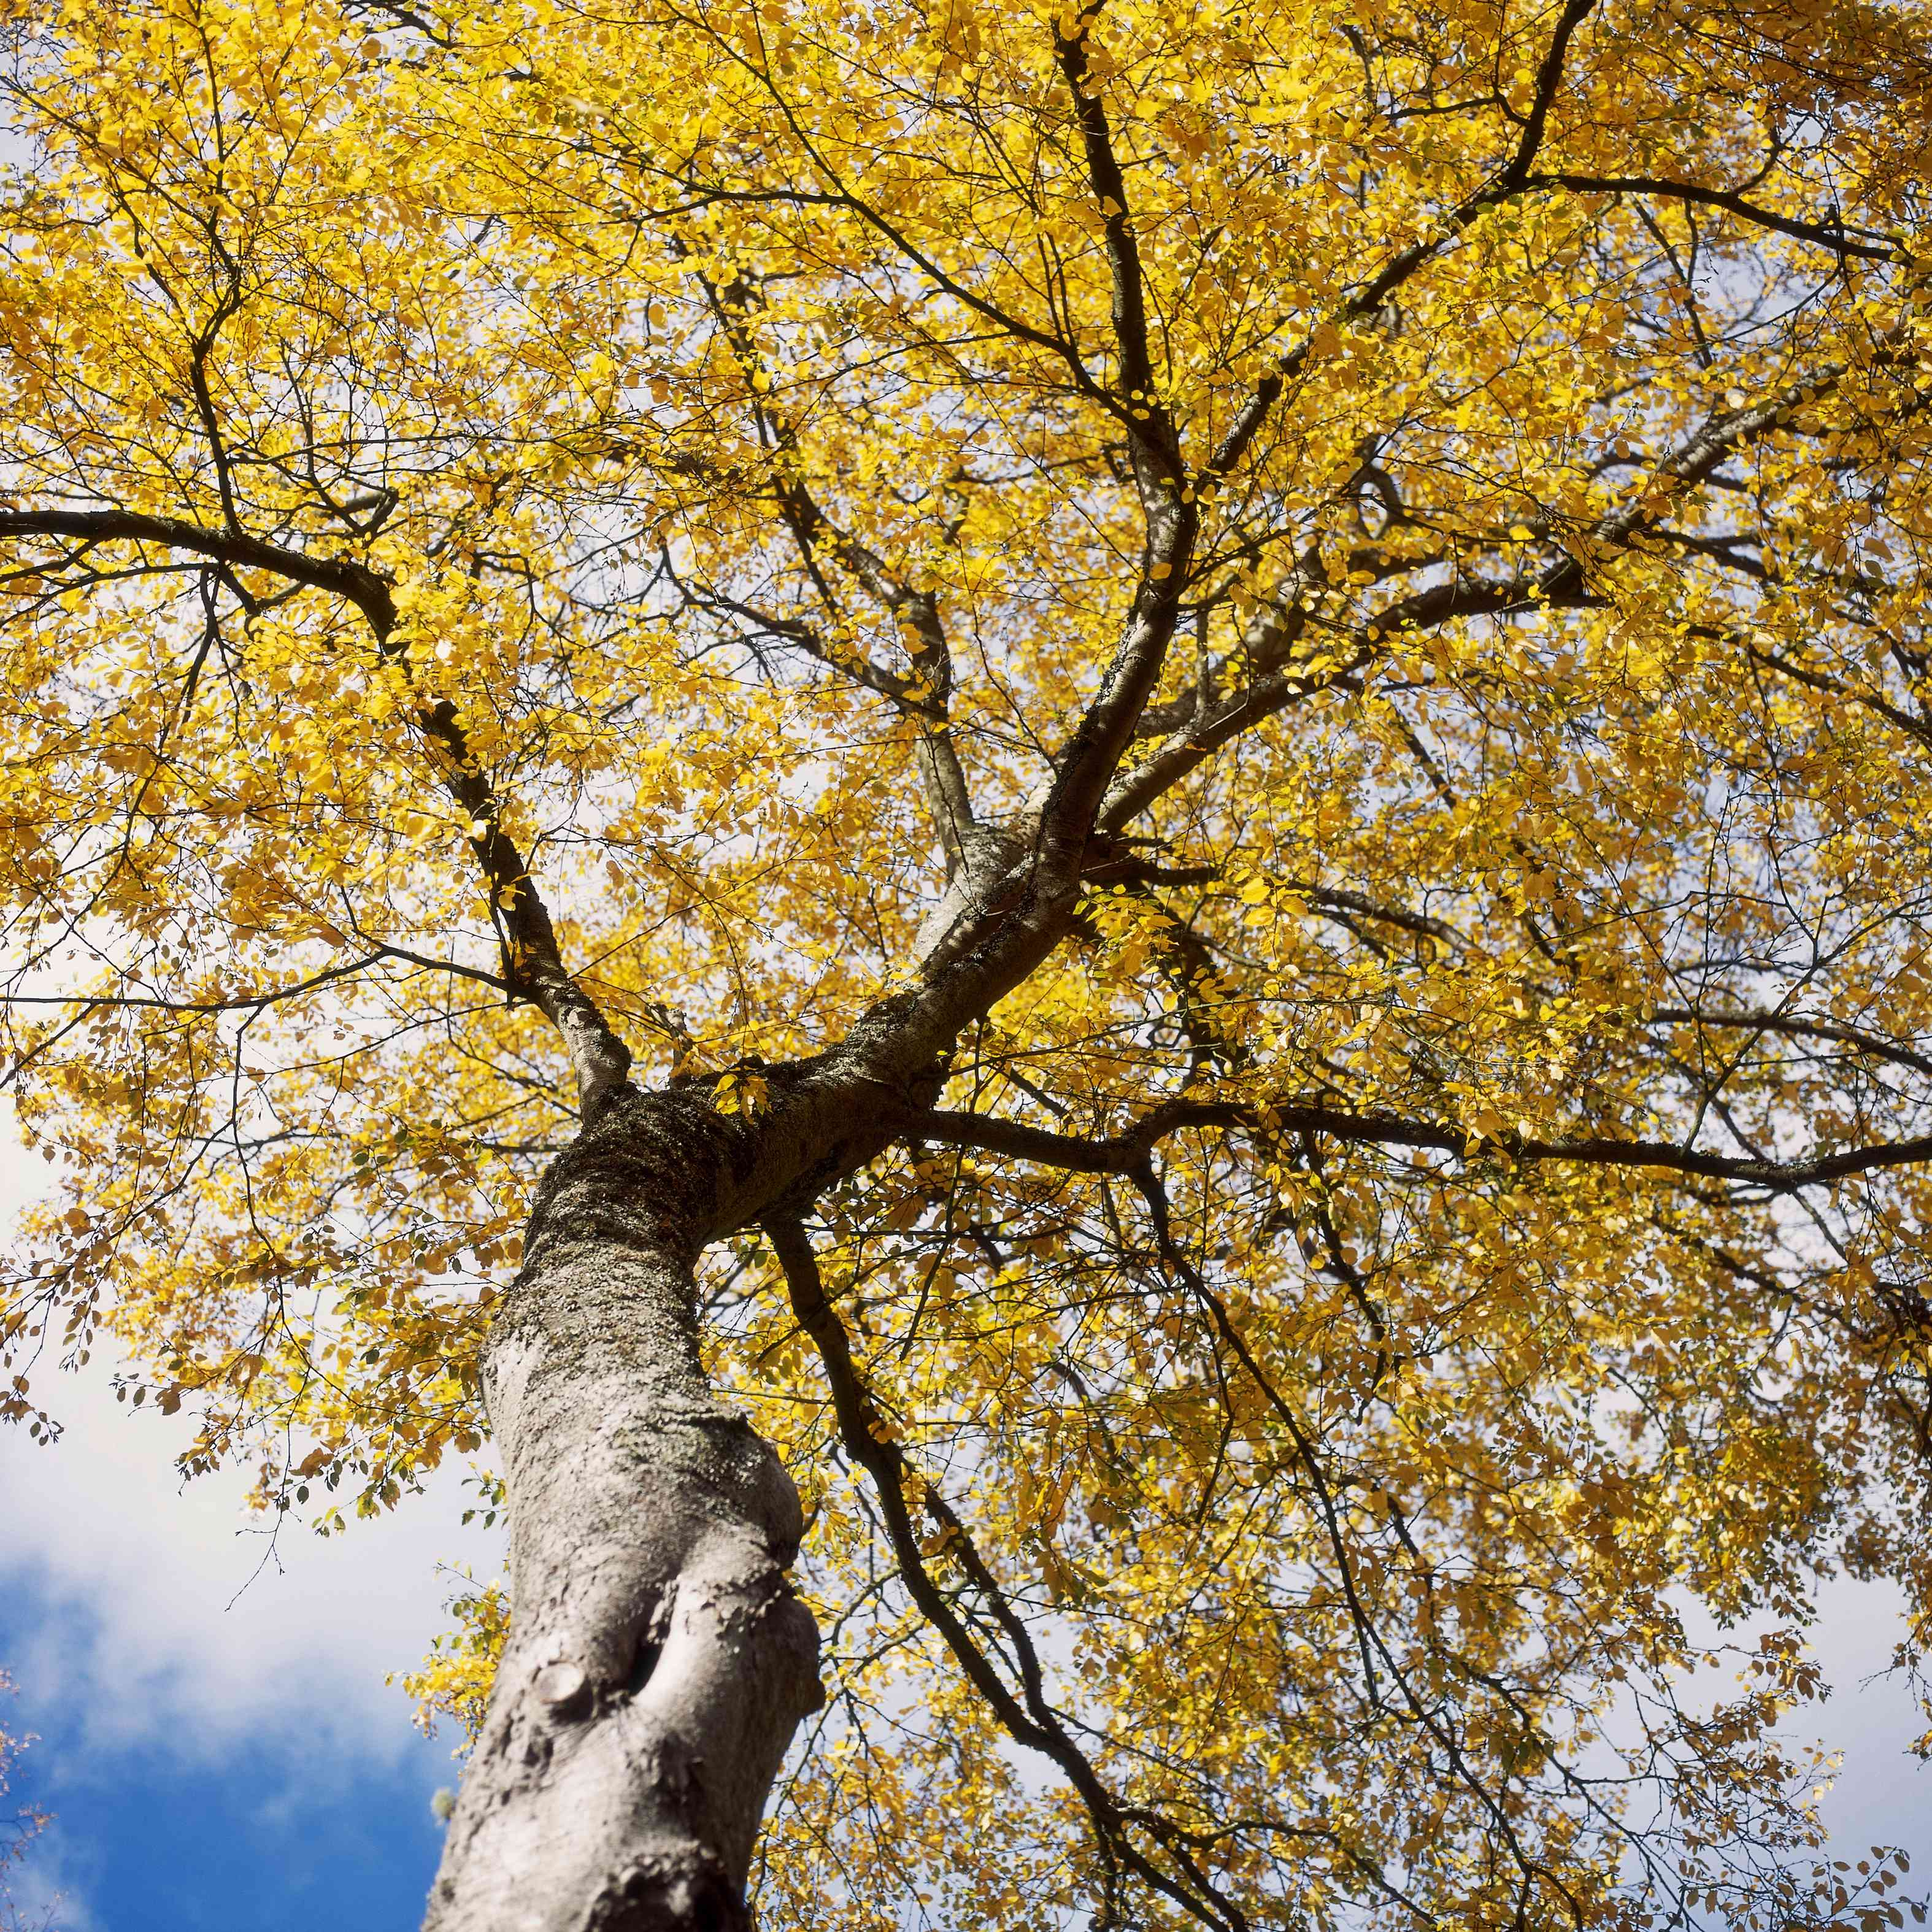 Betula lenta (sweet birch) in autumn colour against a blue sky, hergest croft garden, october